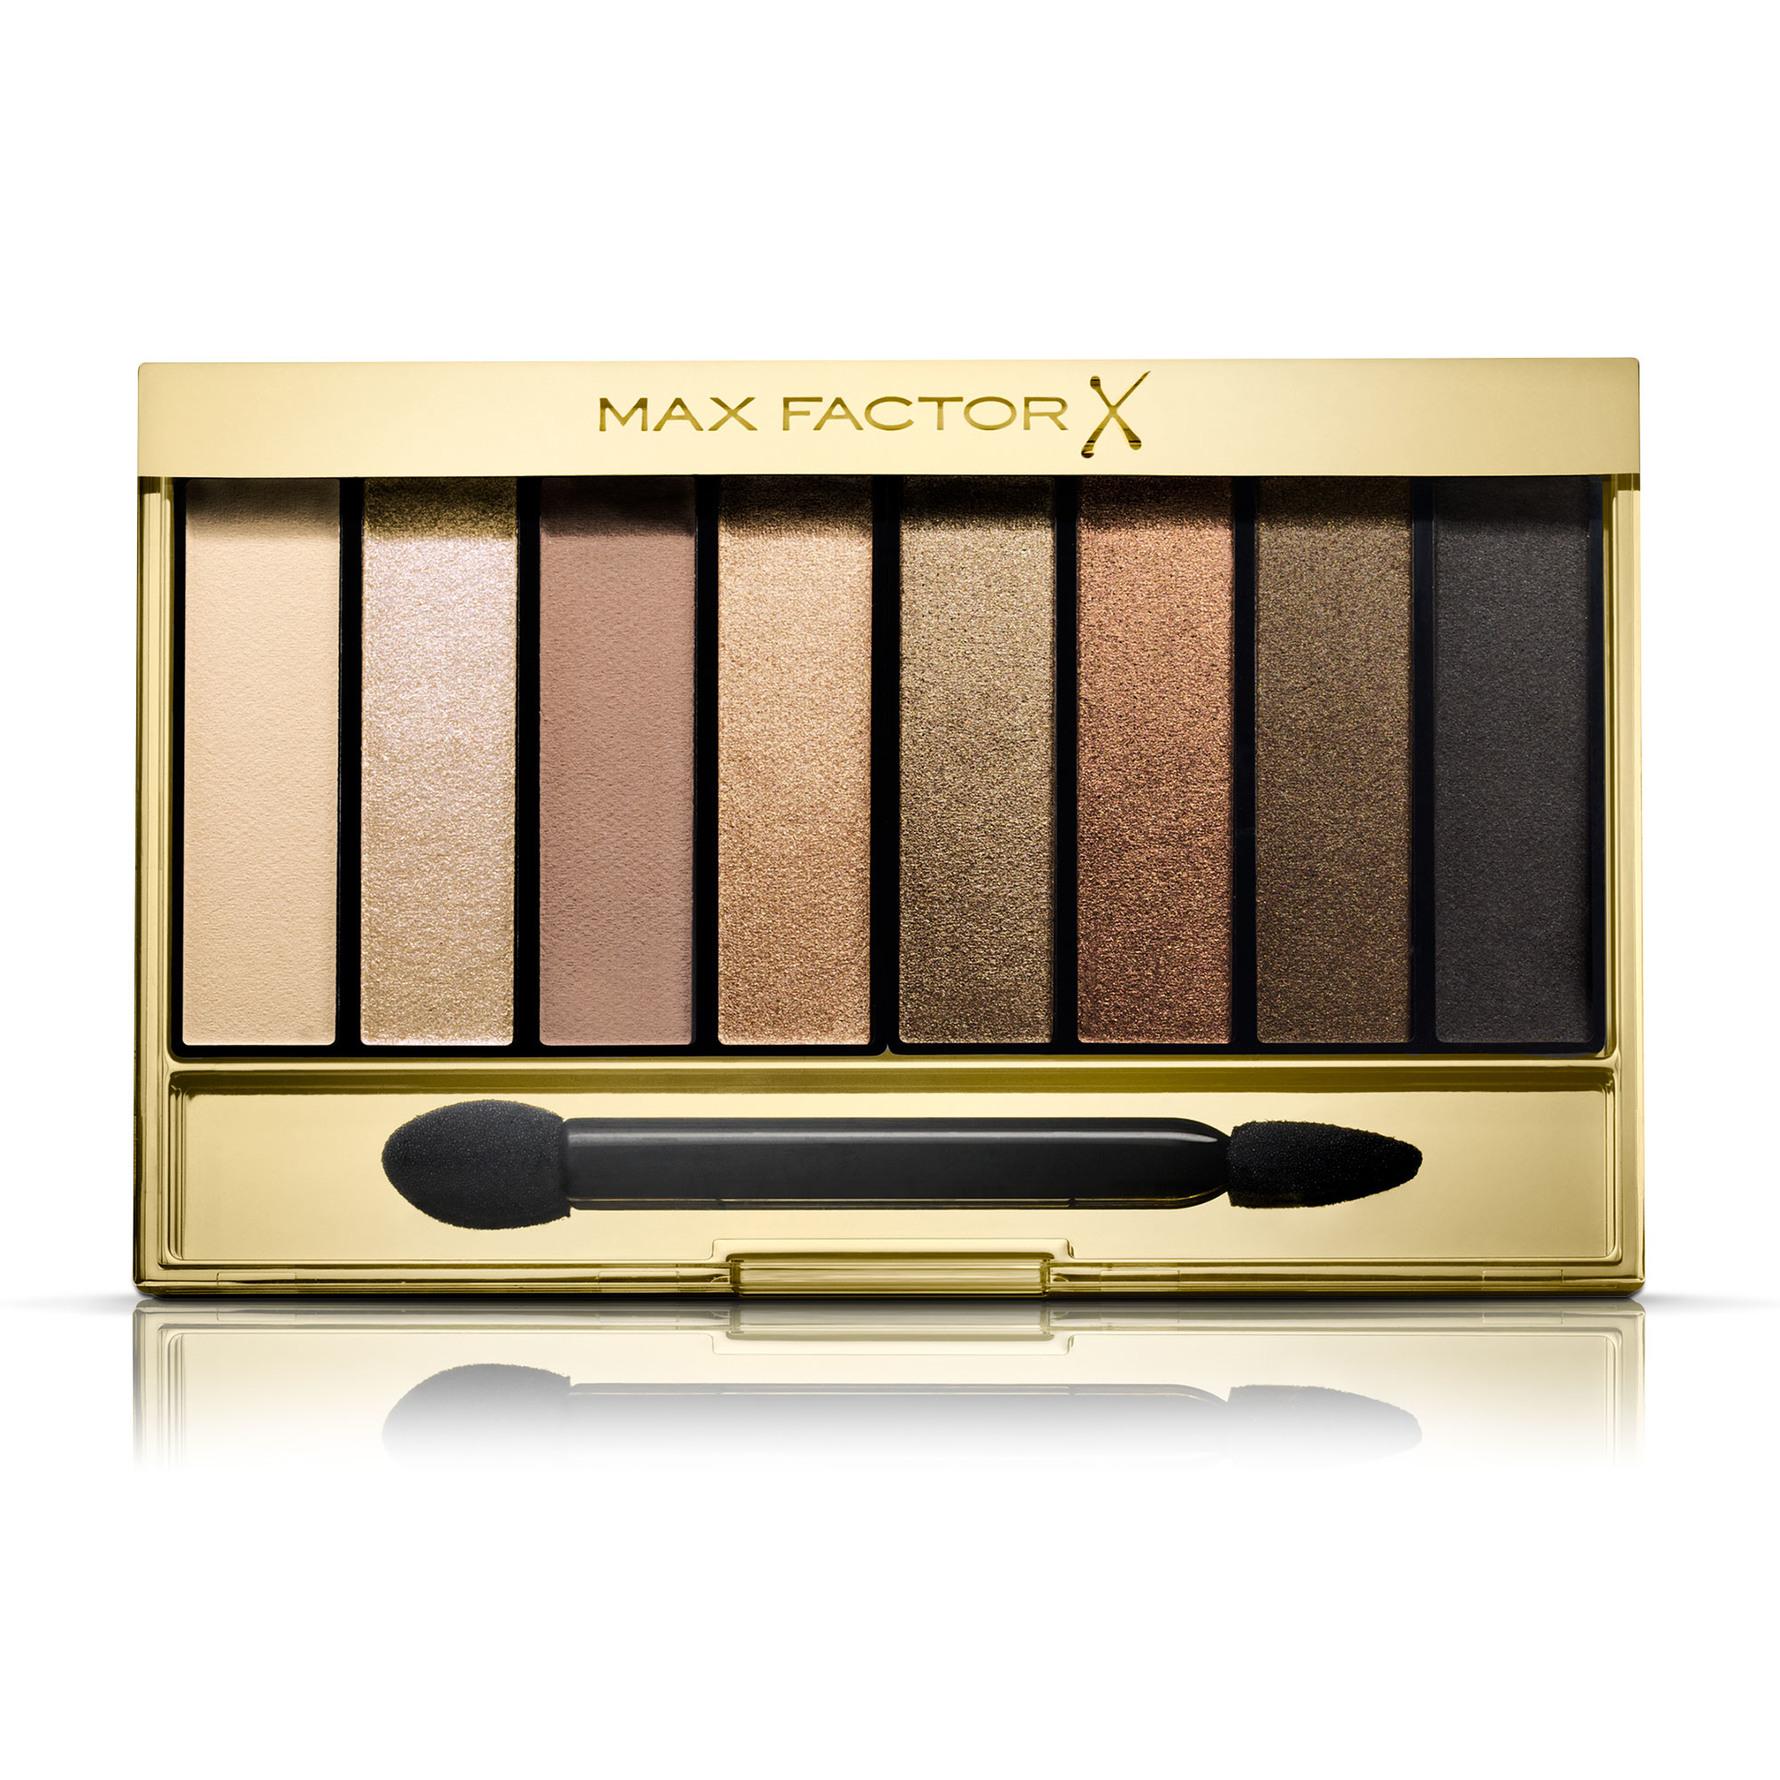 Køb Max factor Masterpiece Nude Palette Nudes 1 - Matas